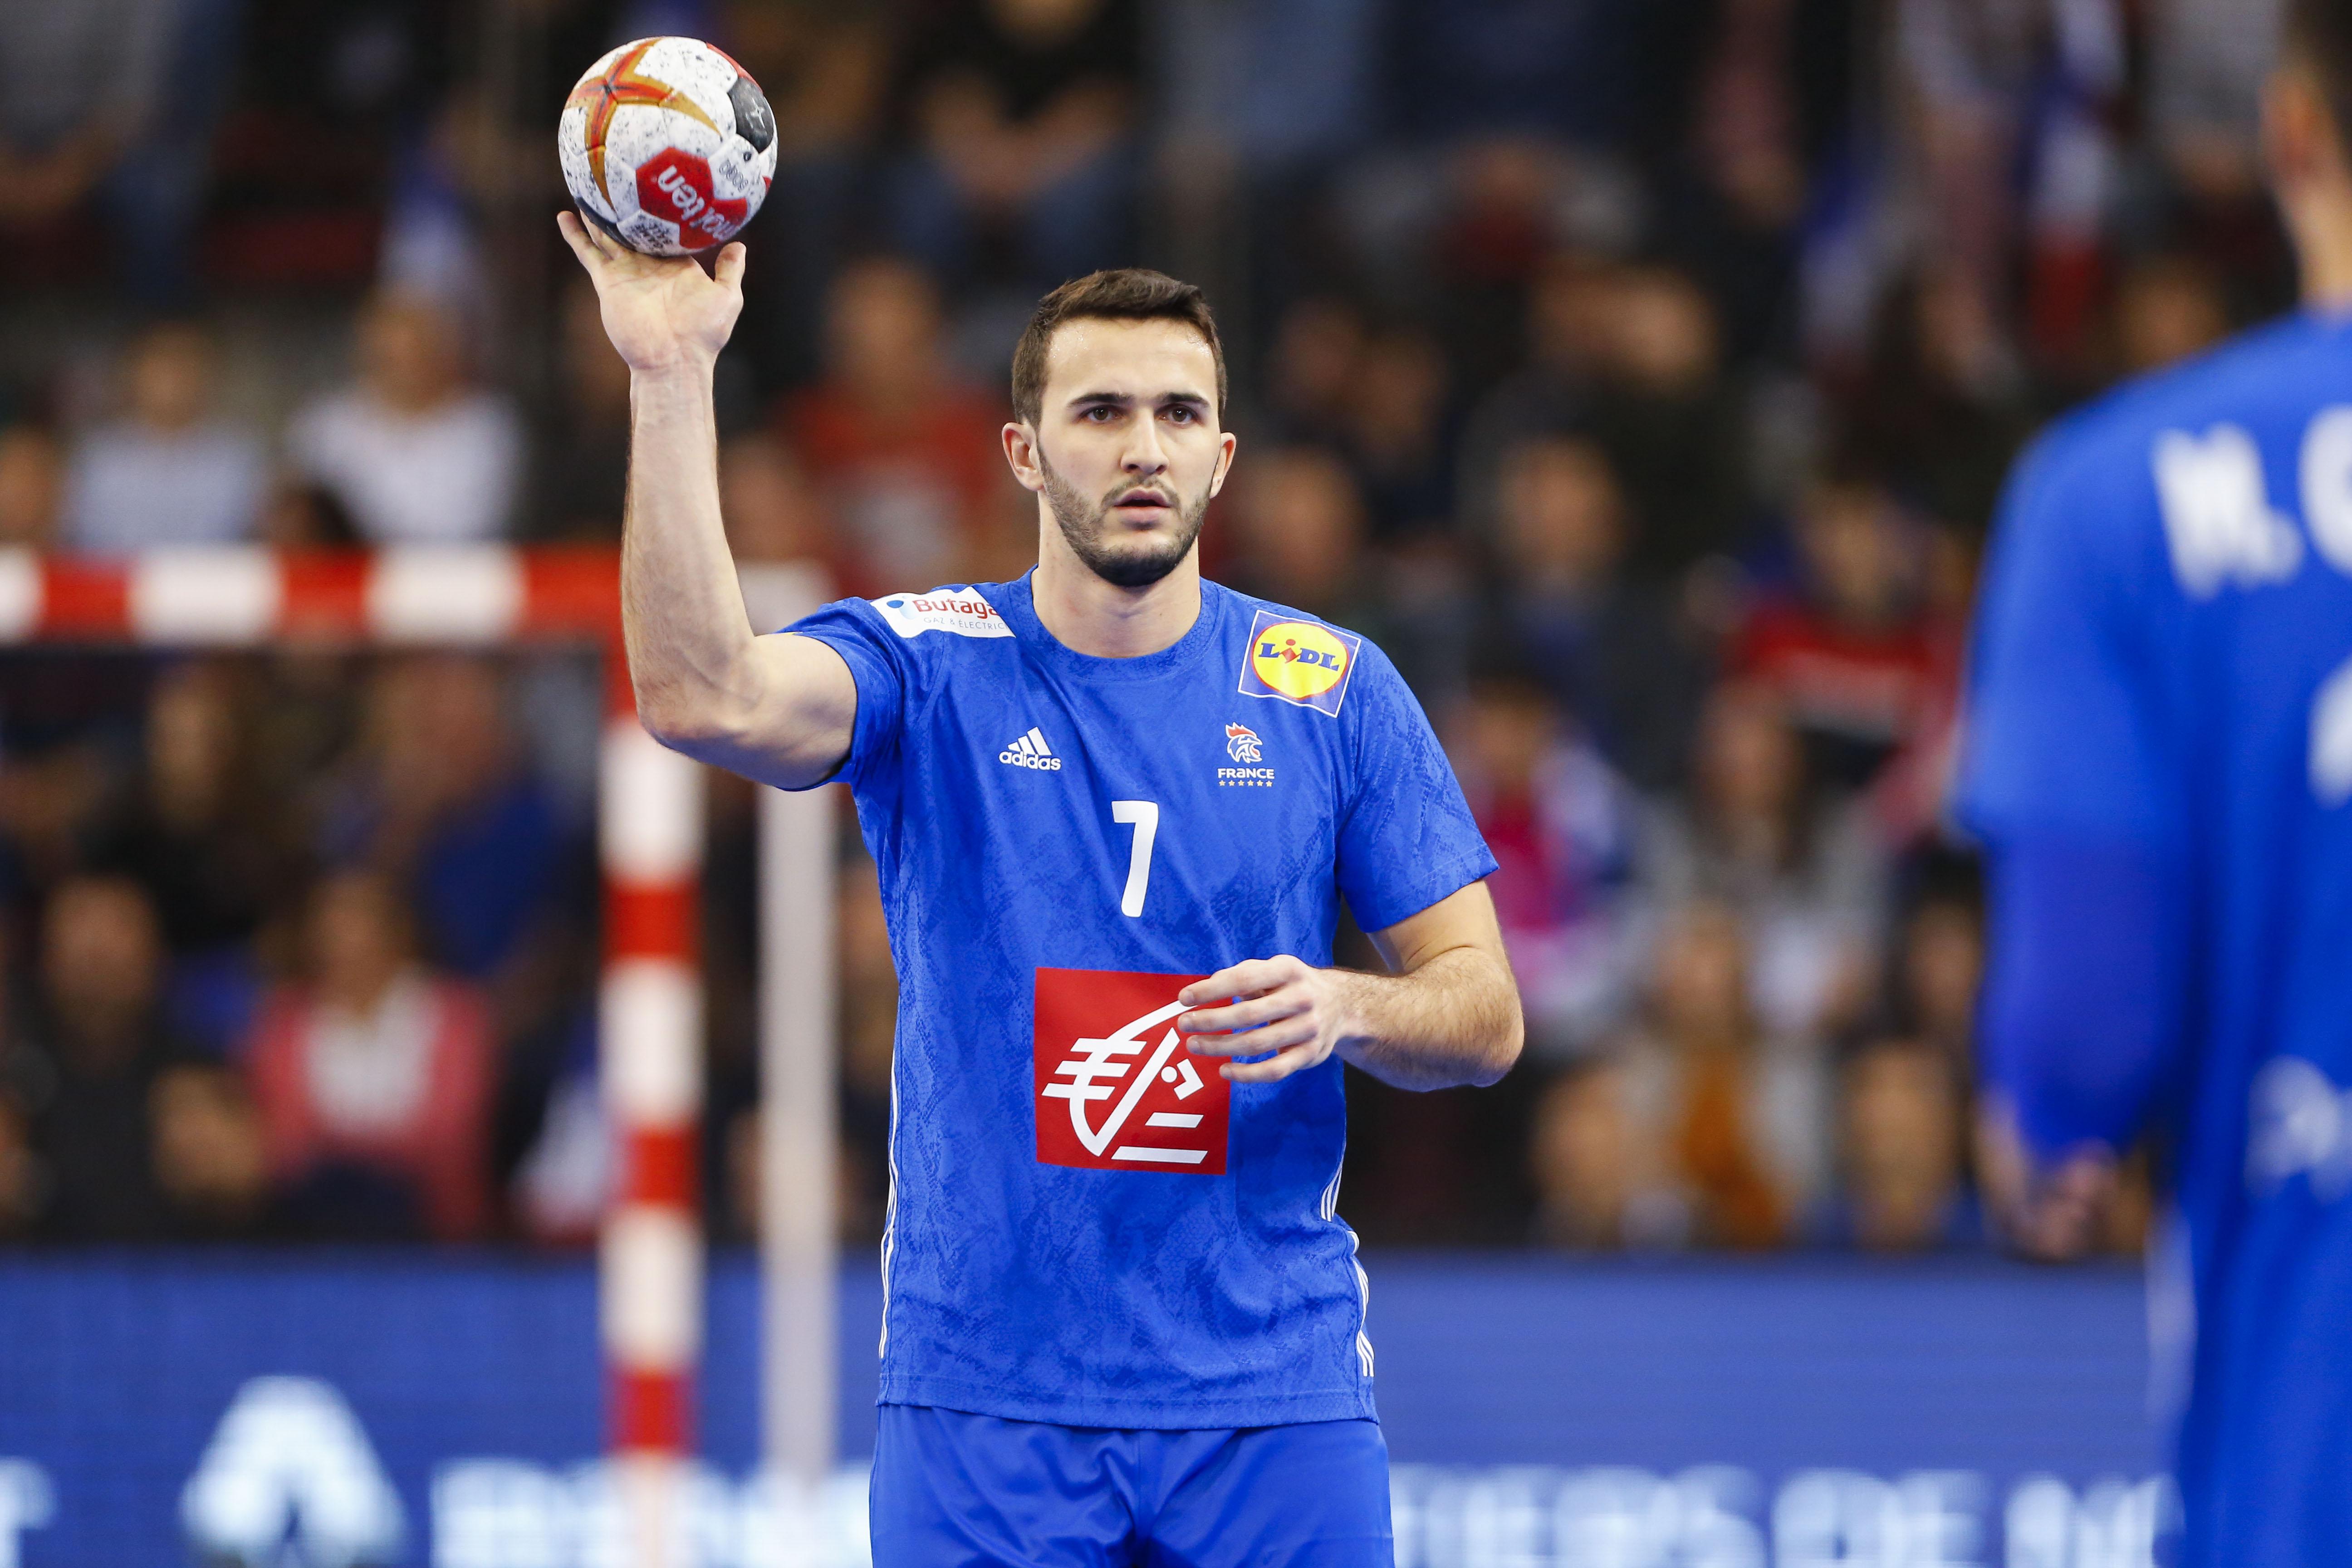 Handball - Equipe de France - Mondial 2019 : «De bon augure pour la suite» selon Romain Lagarde